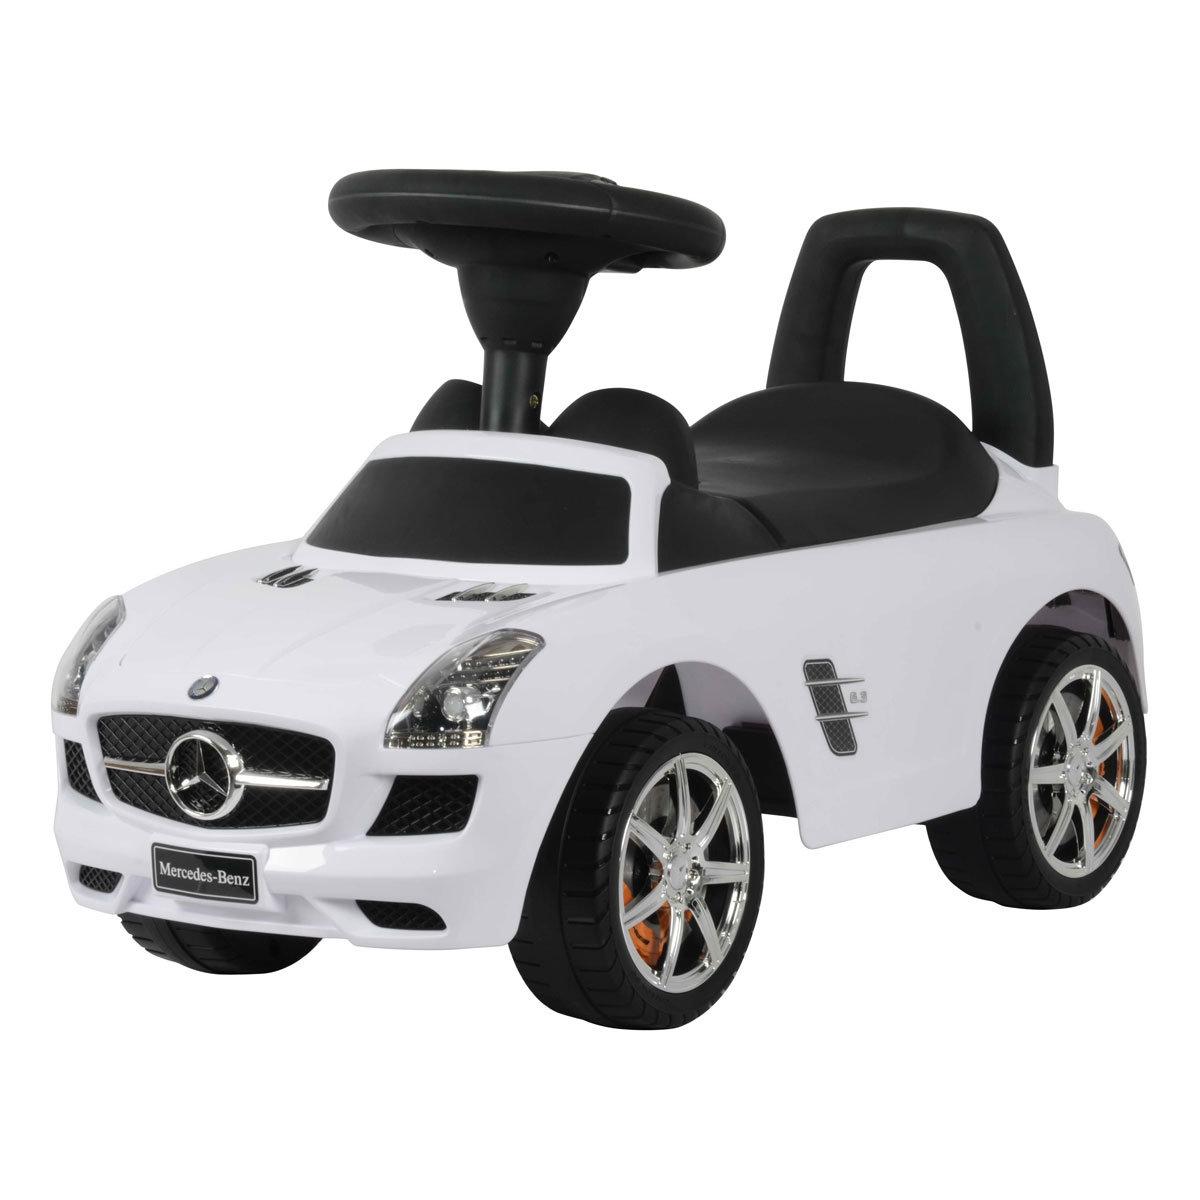 Paspiriamas vaikiškas automobilis Mercedes-Benz SLS Buddy Toys